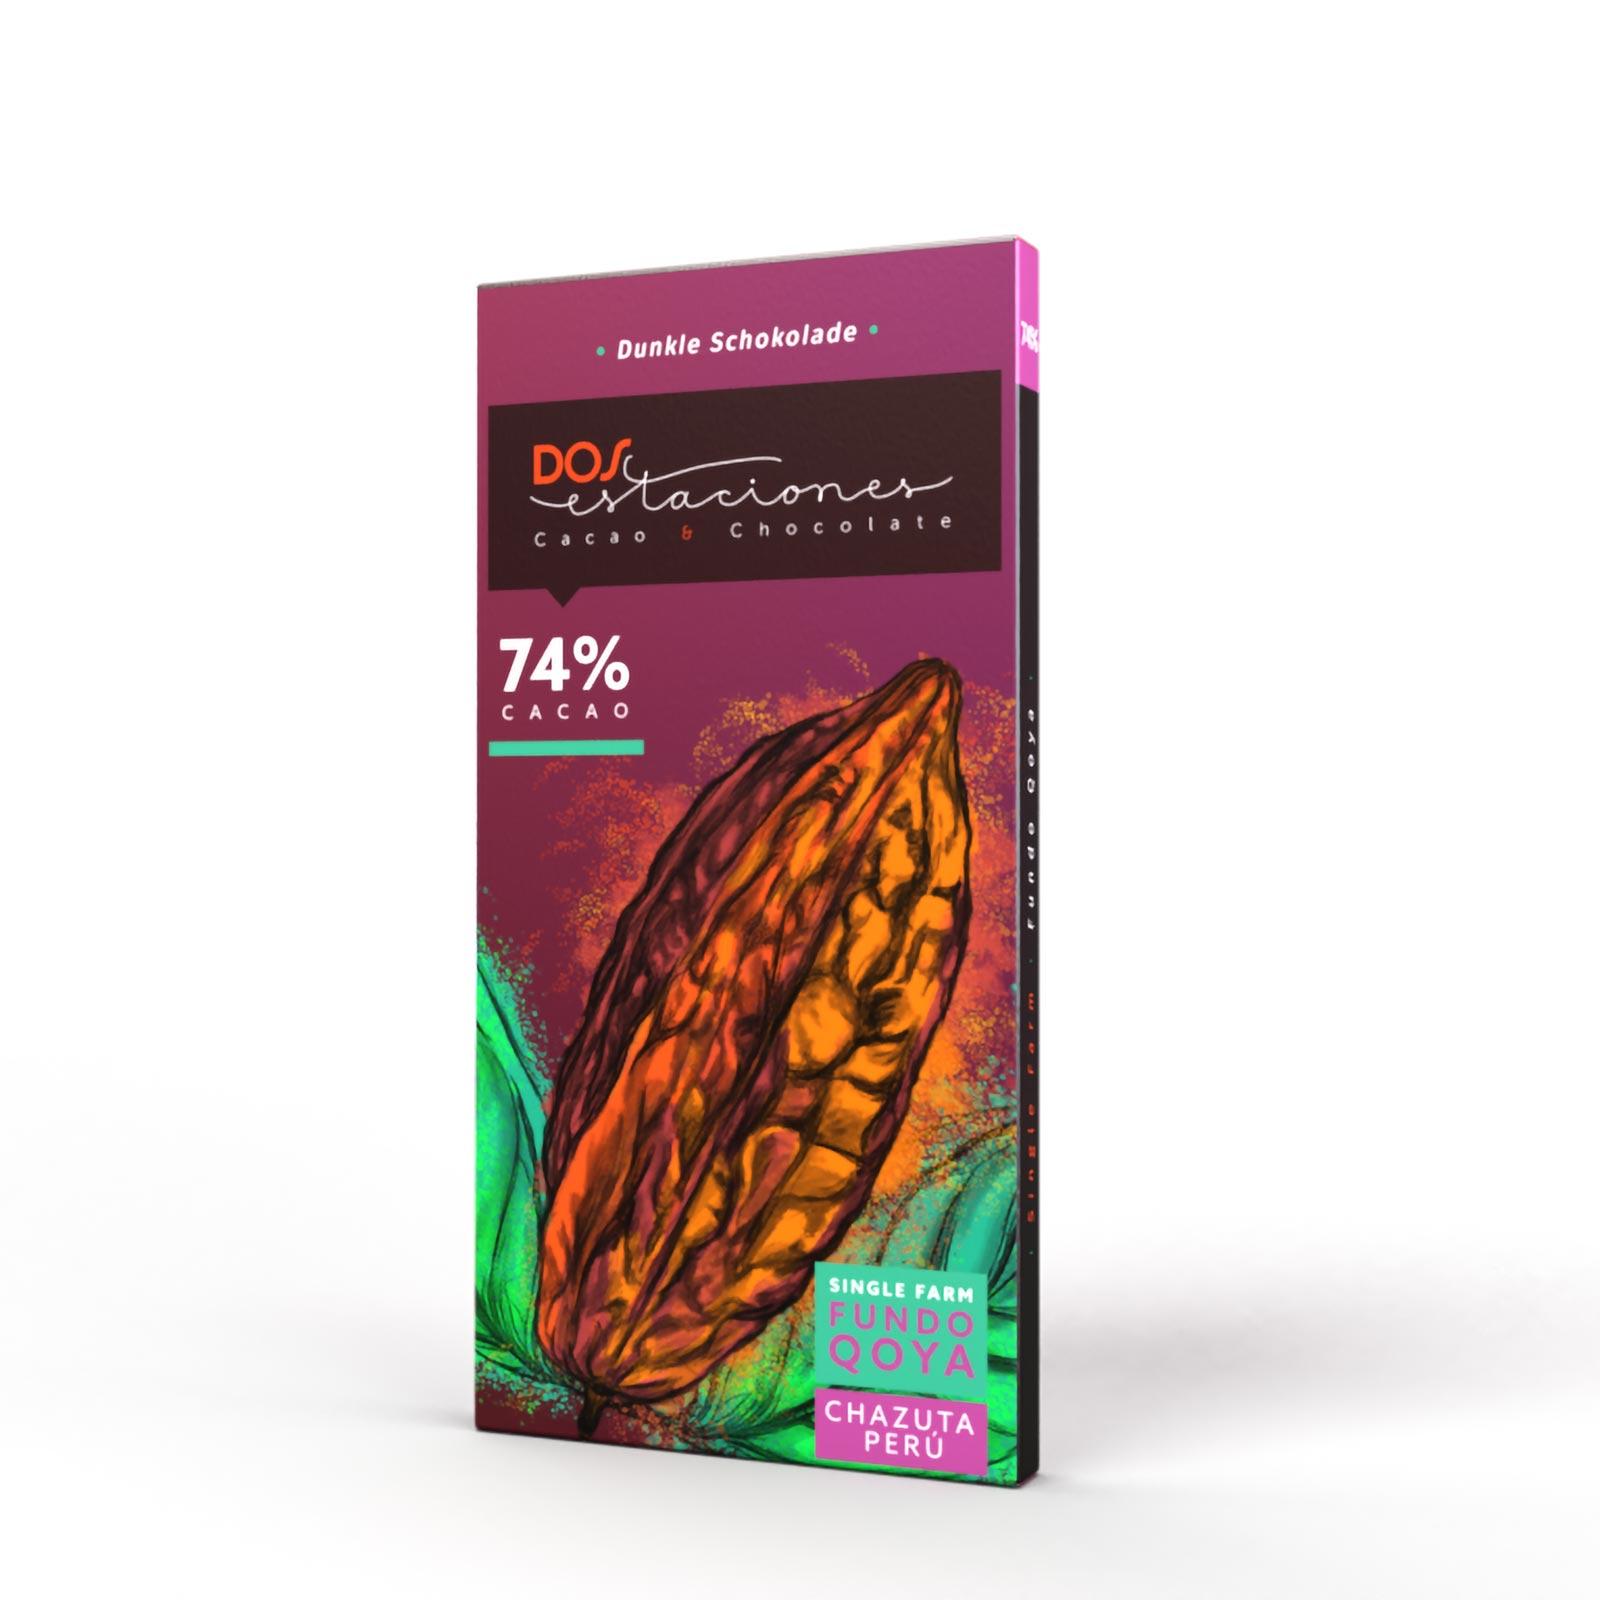 DOS ESTACIONES | Schokolade »Fundo Qoya Chazuta Peru« 74%